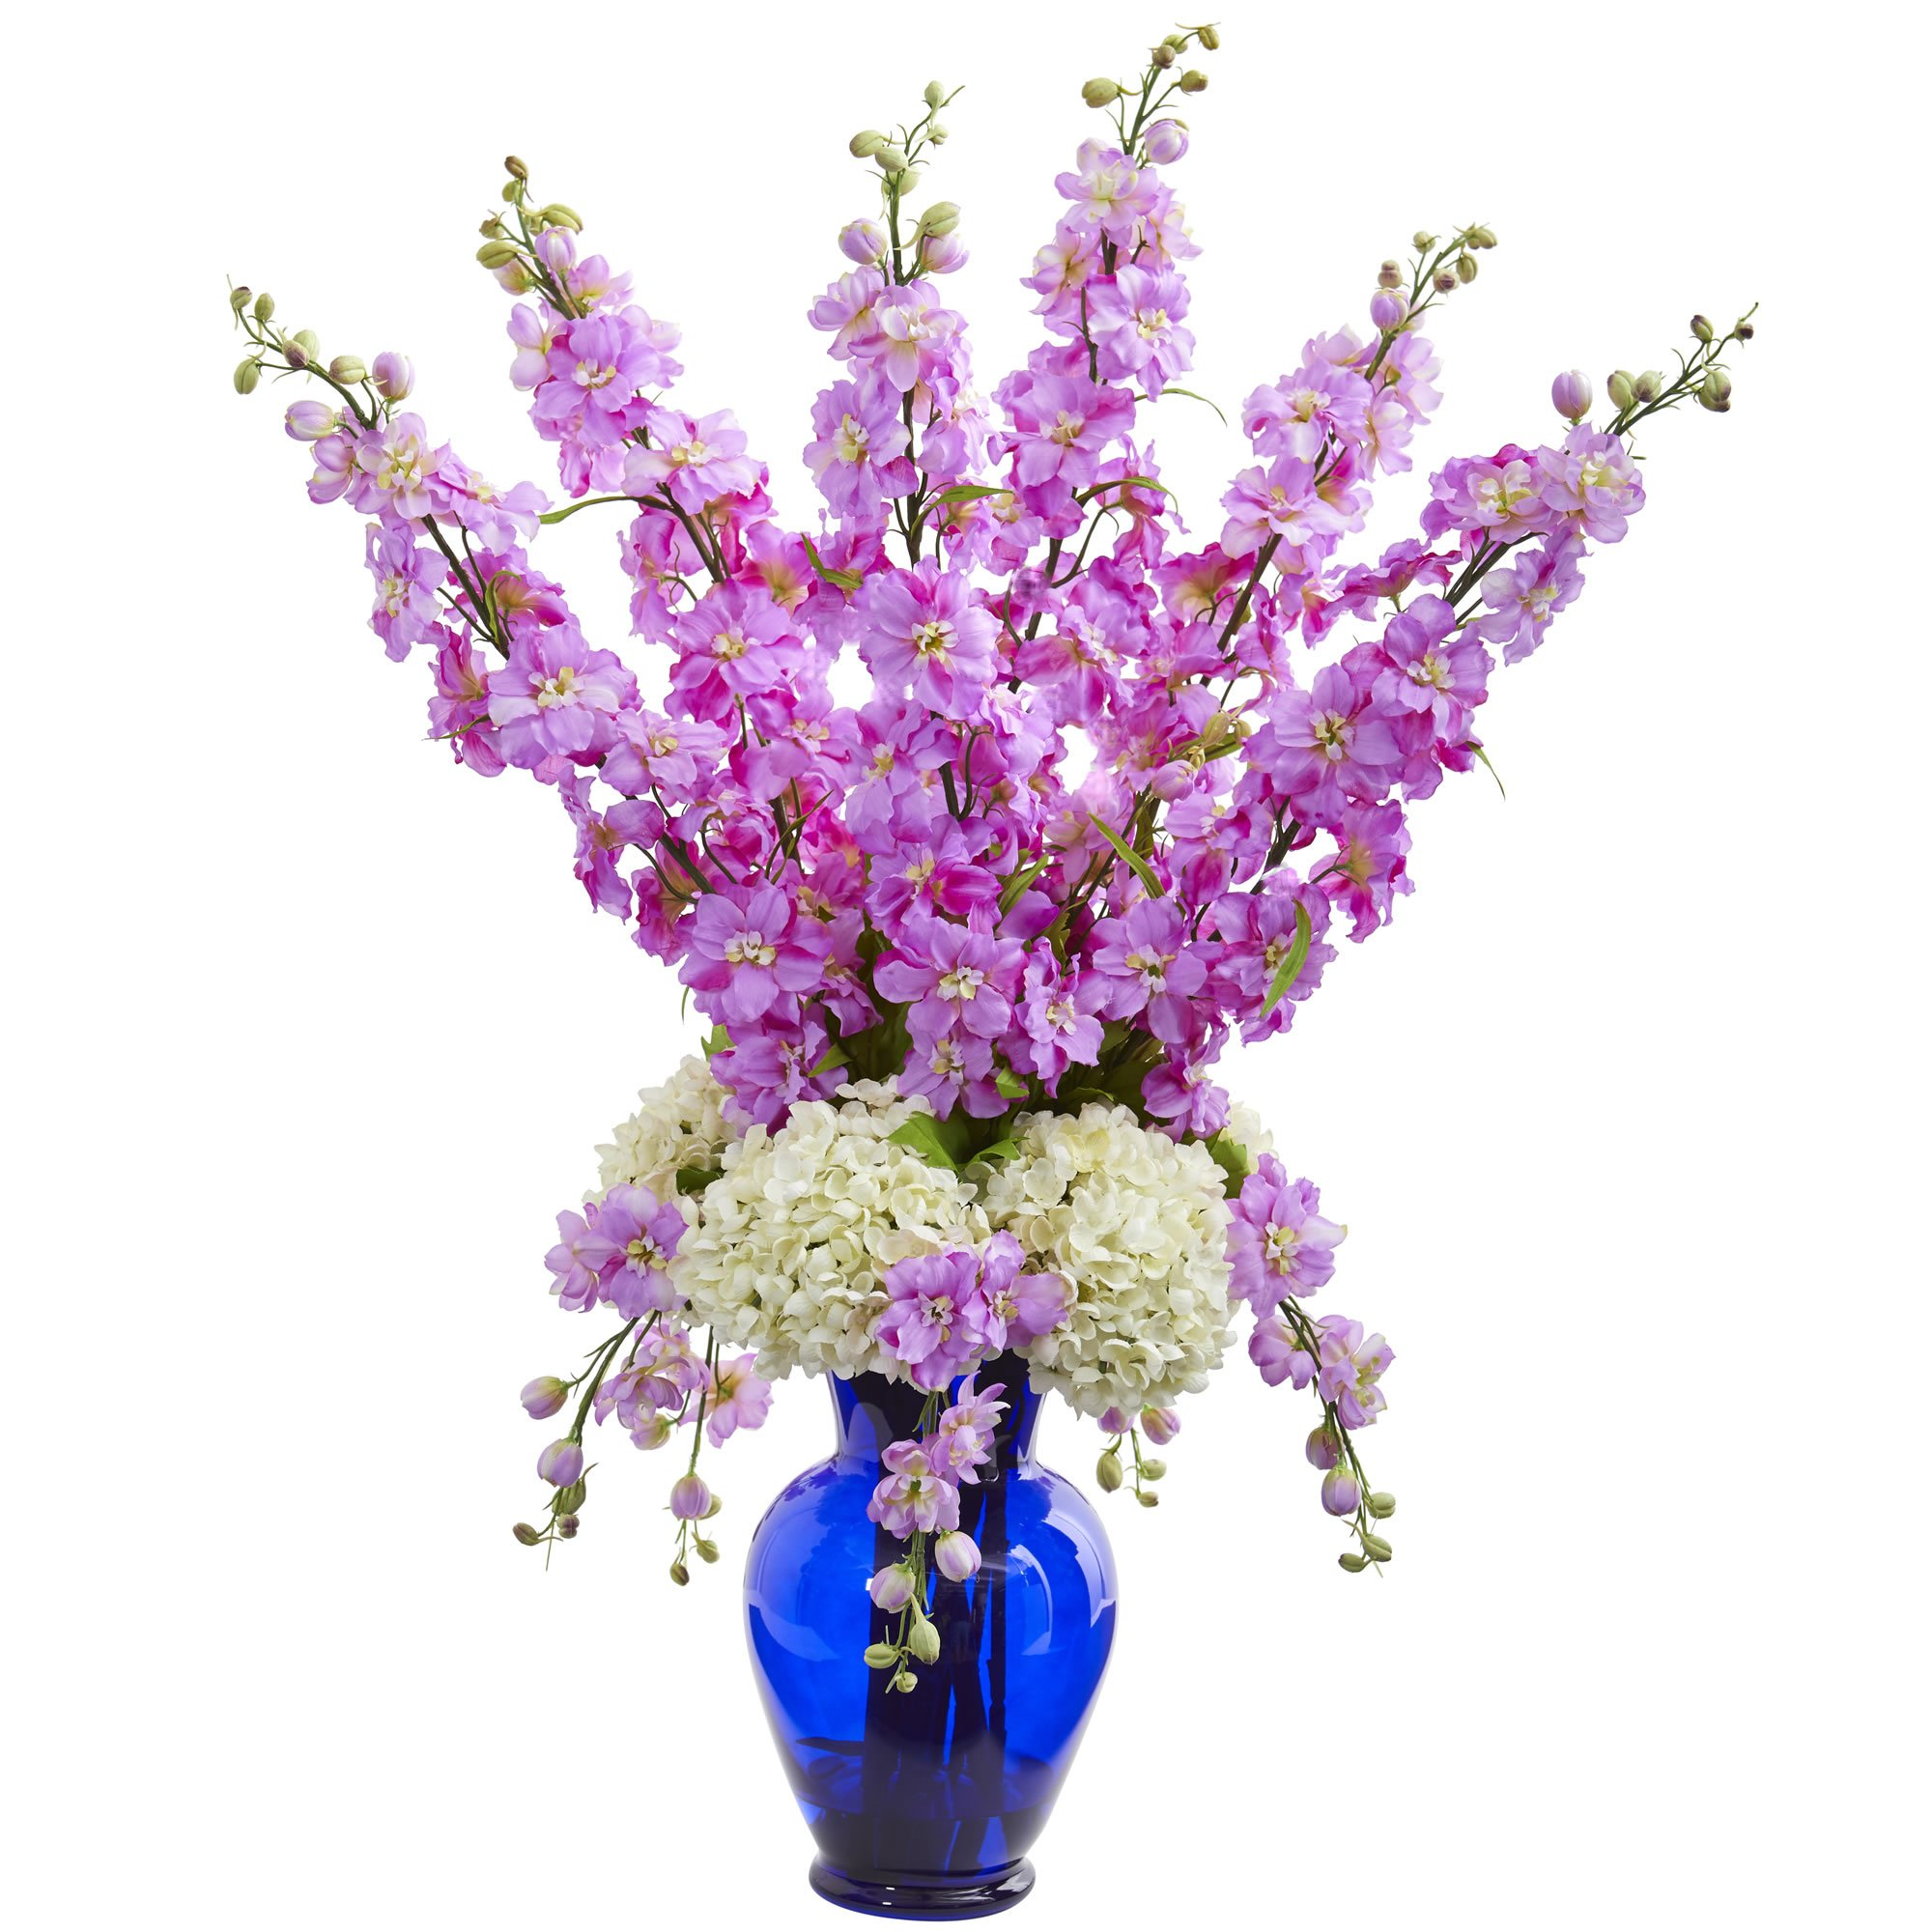 Nearly-Natural-1657-LV-Delphinium-and-Hydrangea-Artificial-Blue-Vase-Silk-Arrangements-Lavender